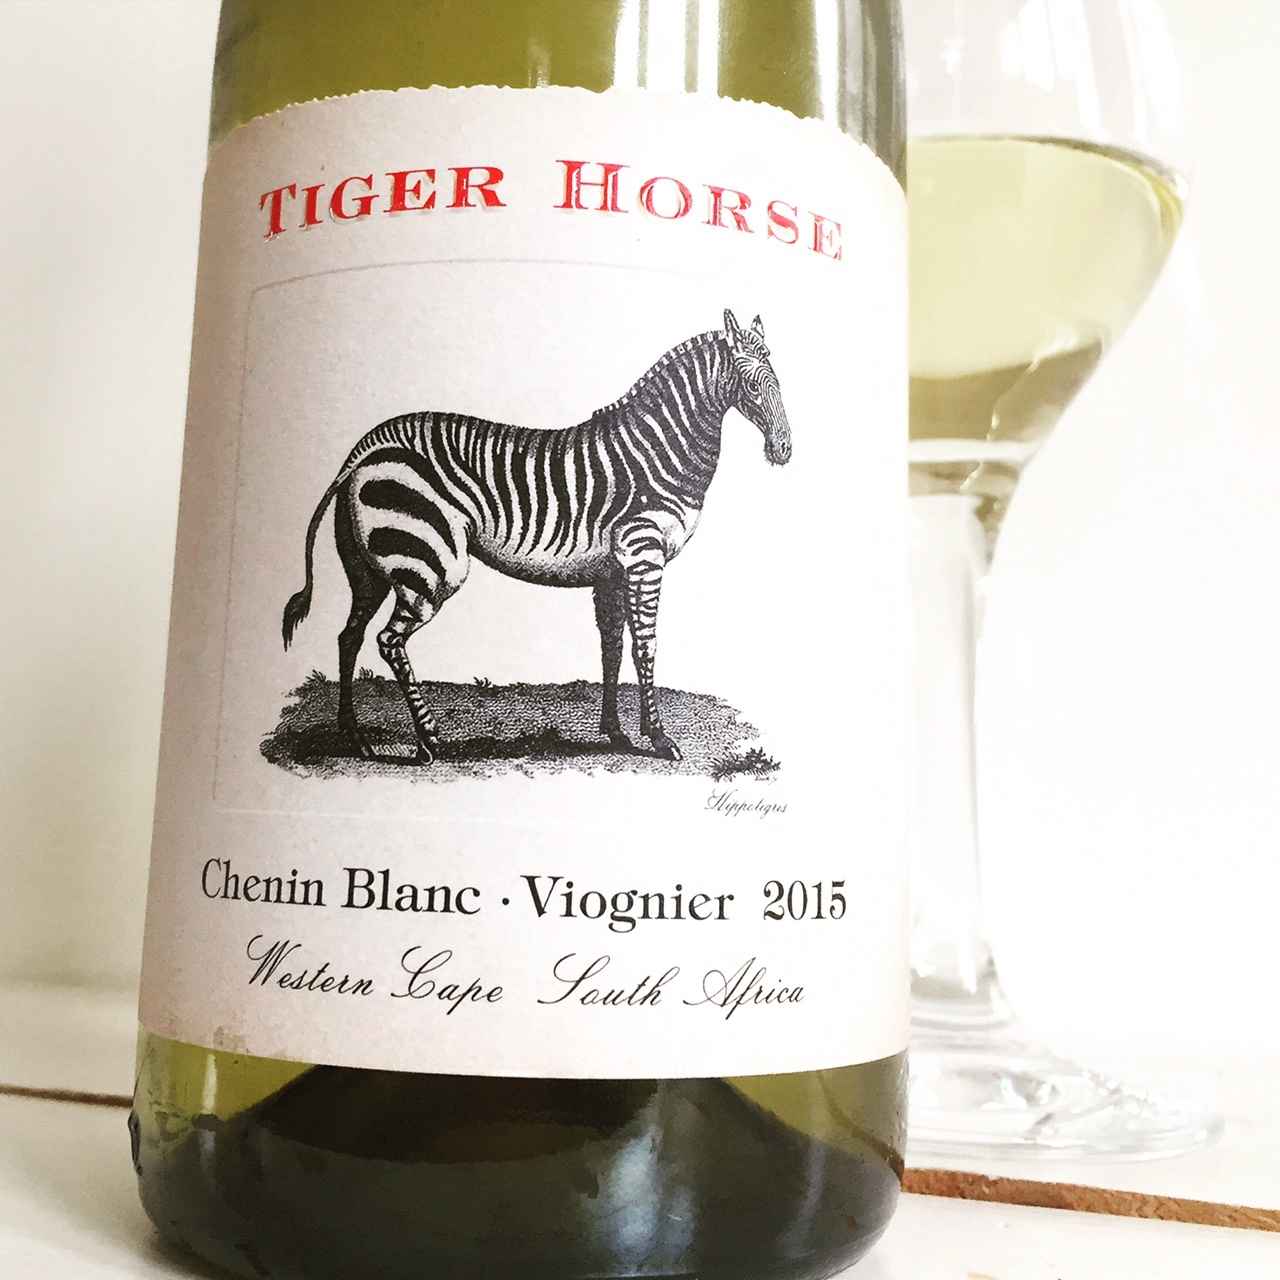 Tiger Horse Chenin Blanc-Viognier Review